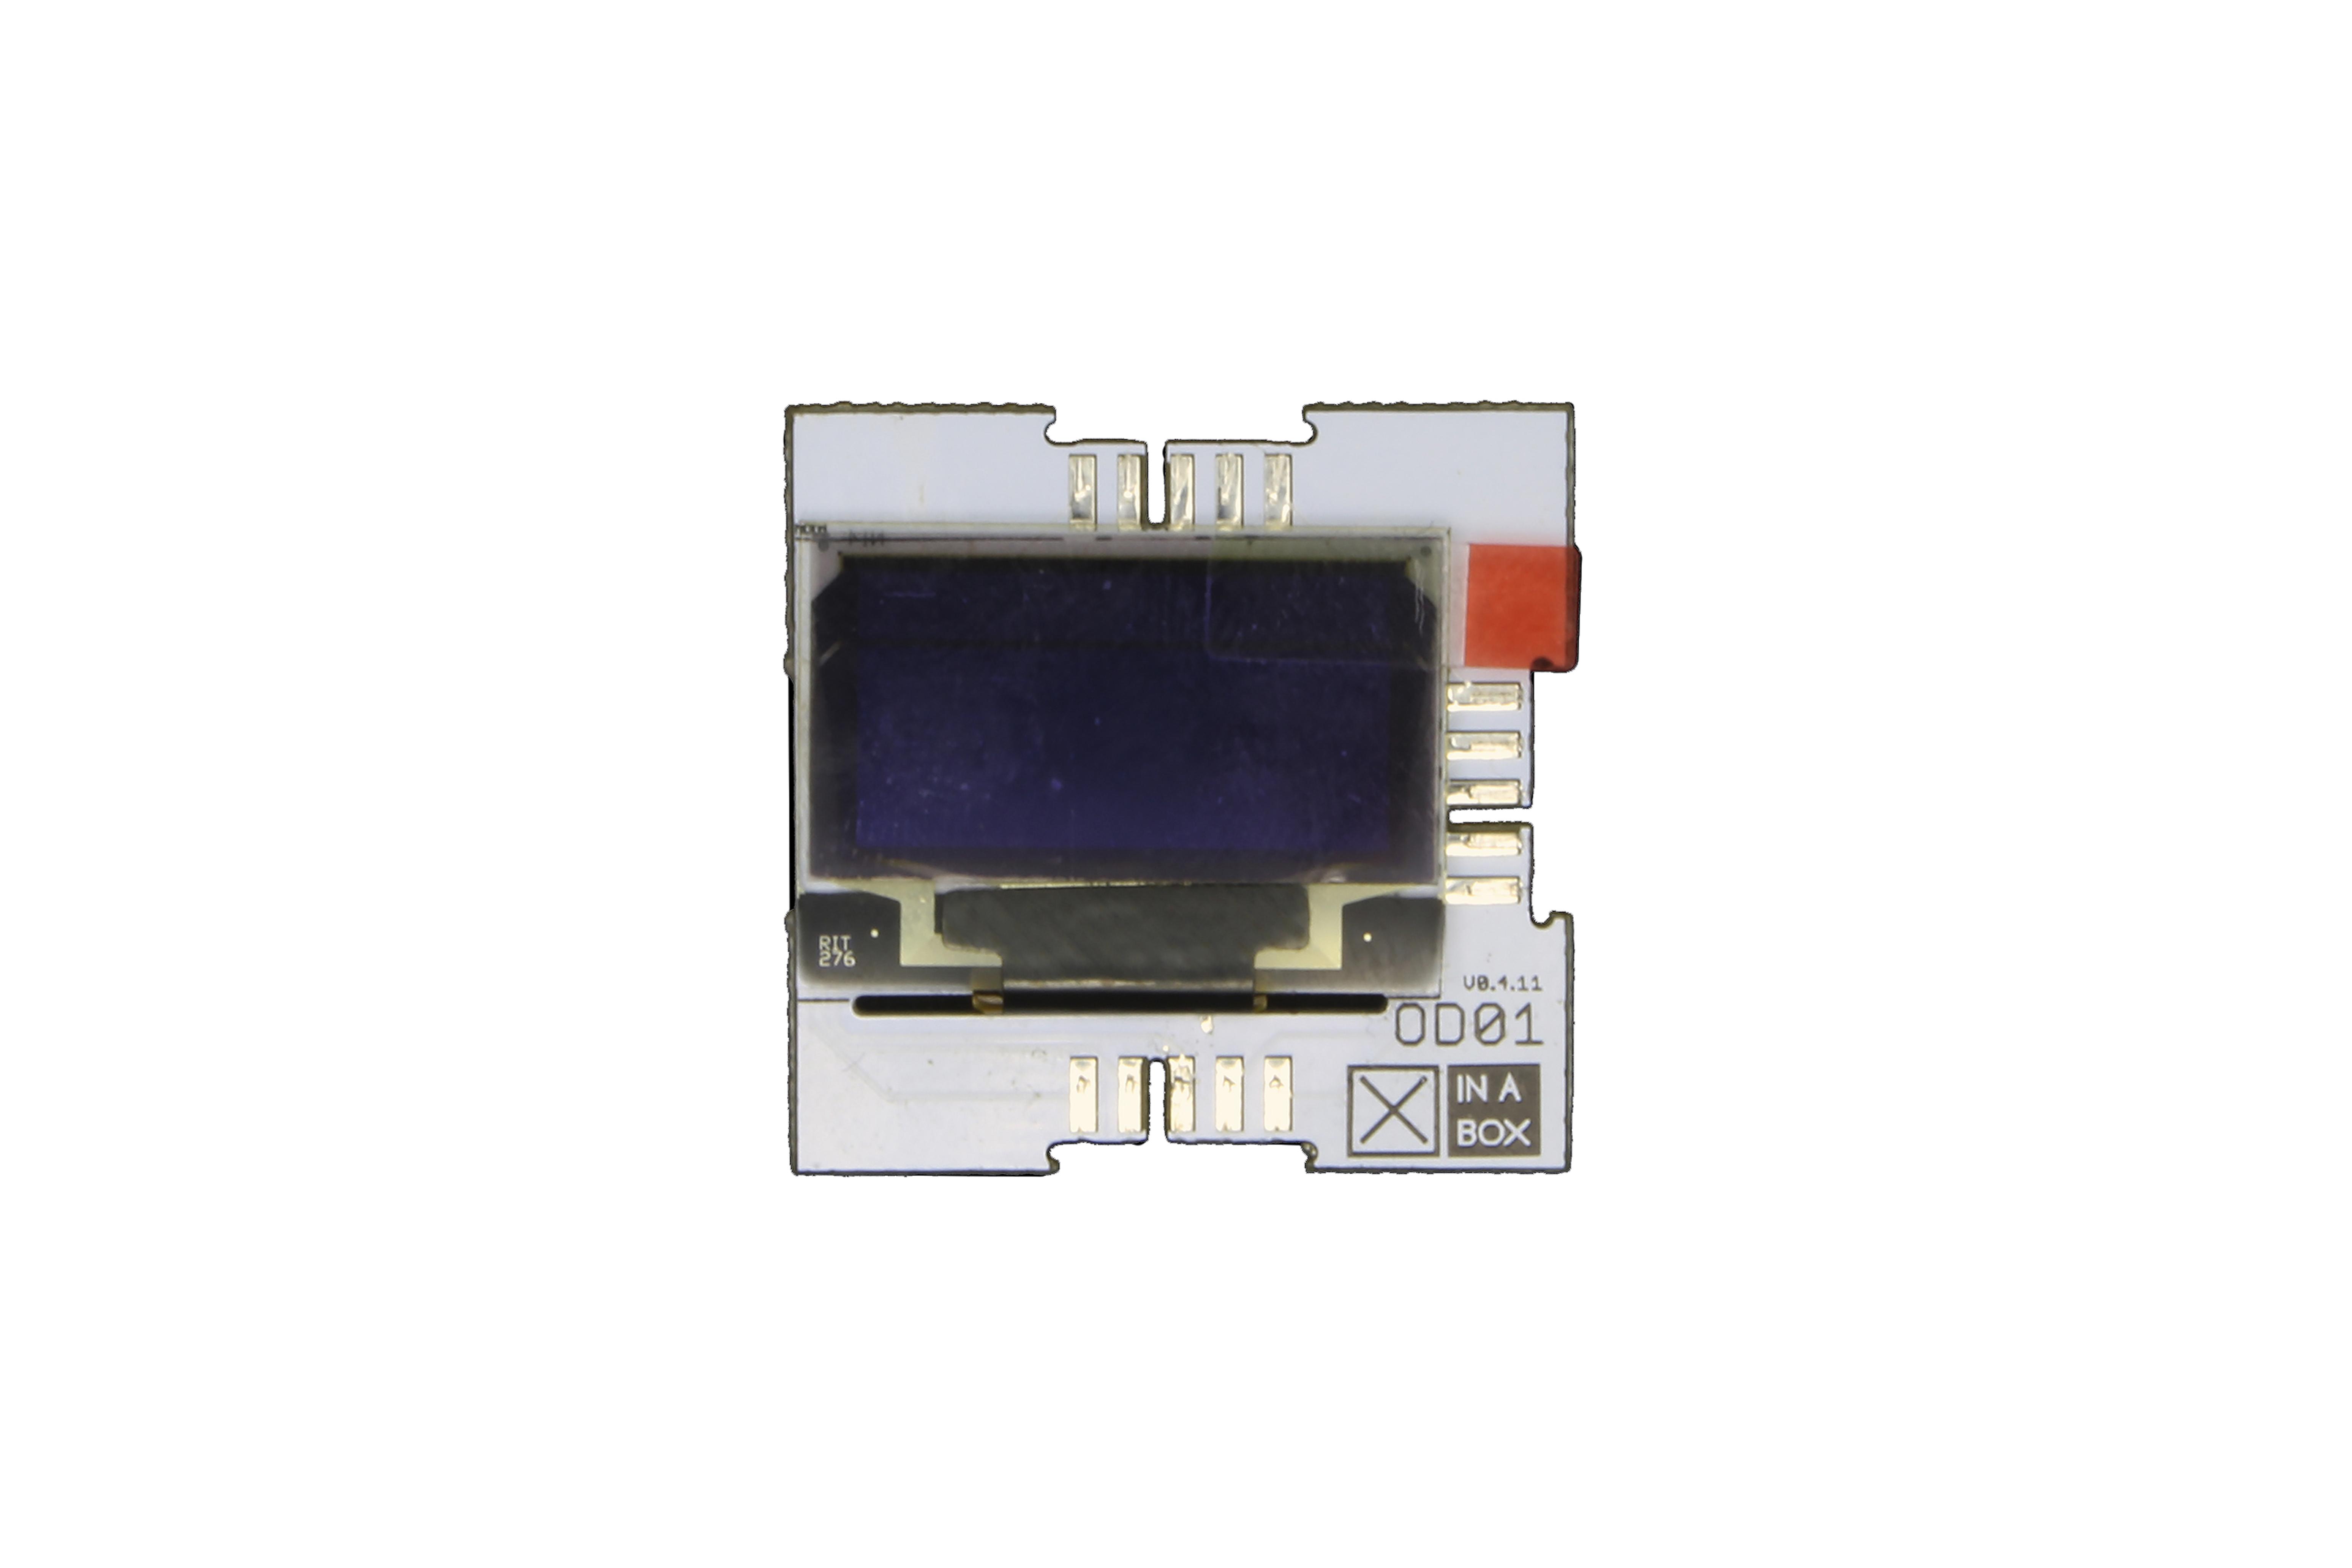 Xinabox Od01 - Oled Display 128X64 (Ssd1306)